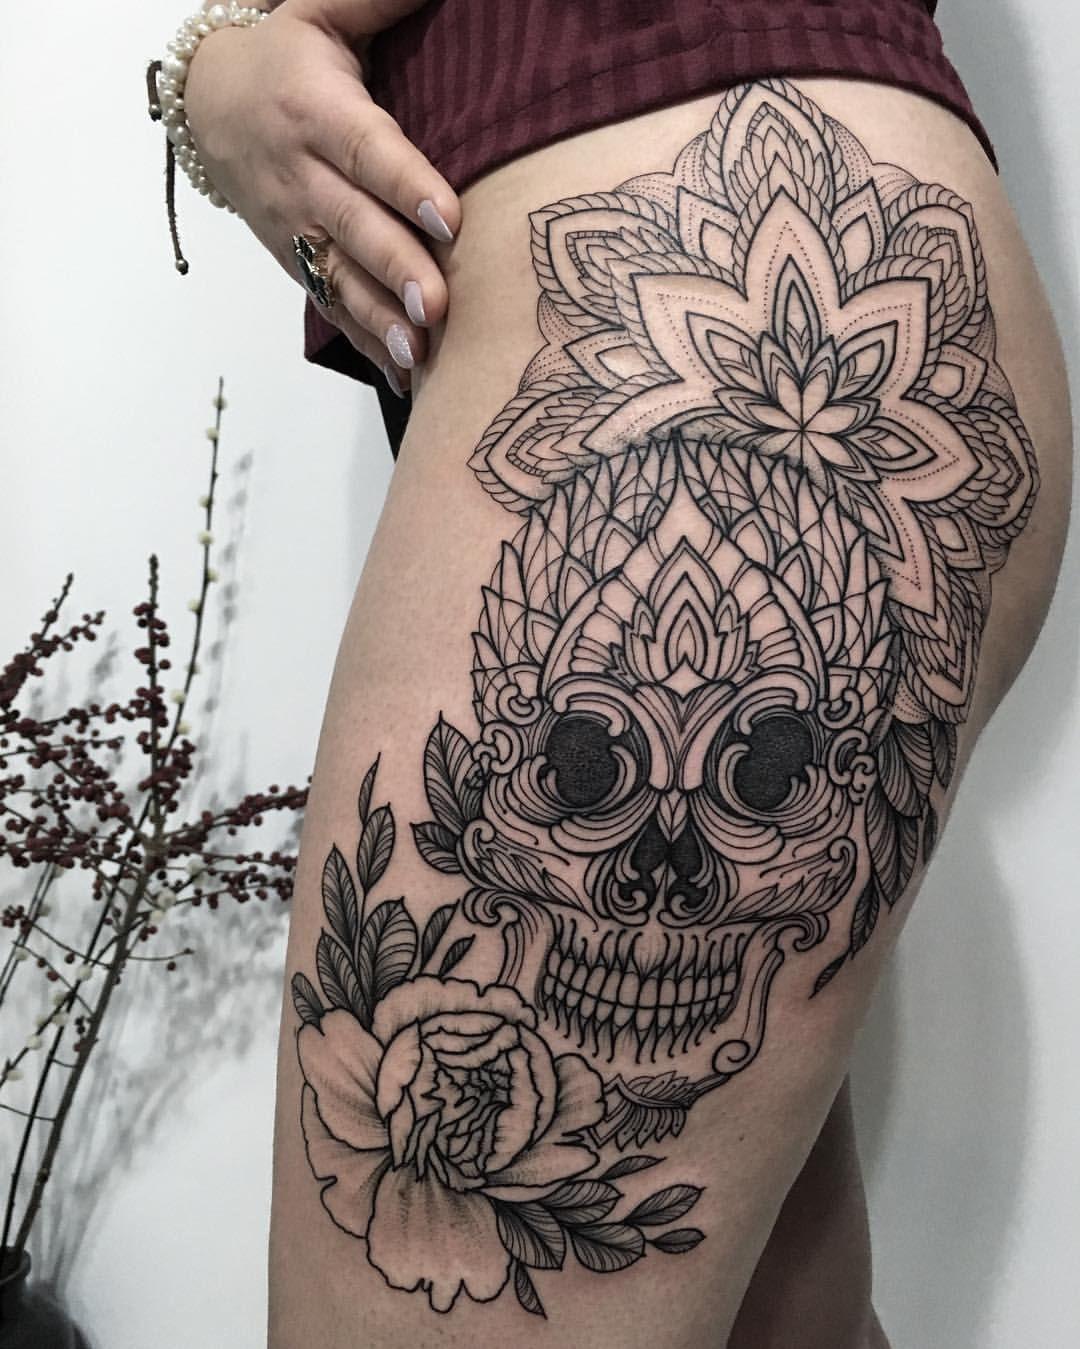 SASHATATTOOING Photo Lace skull tattoo, Back tattoo